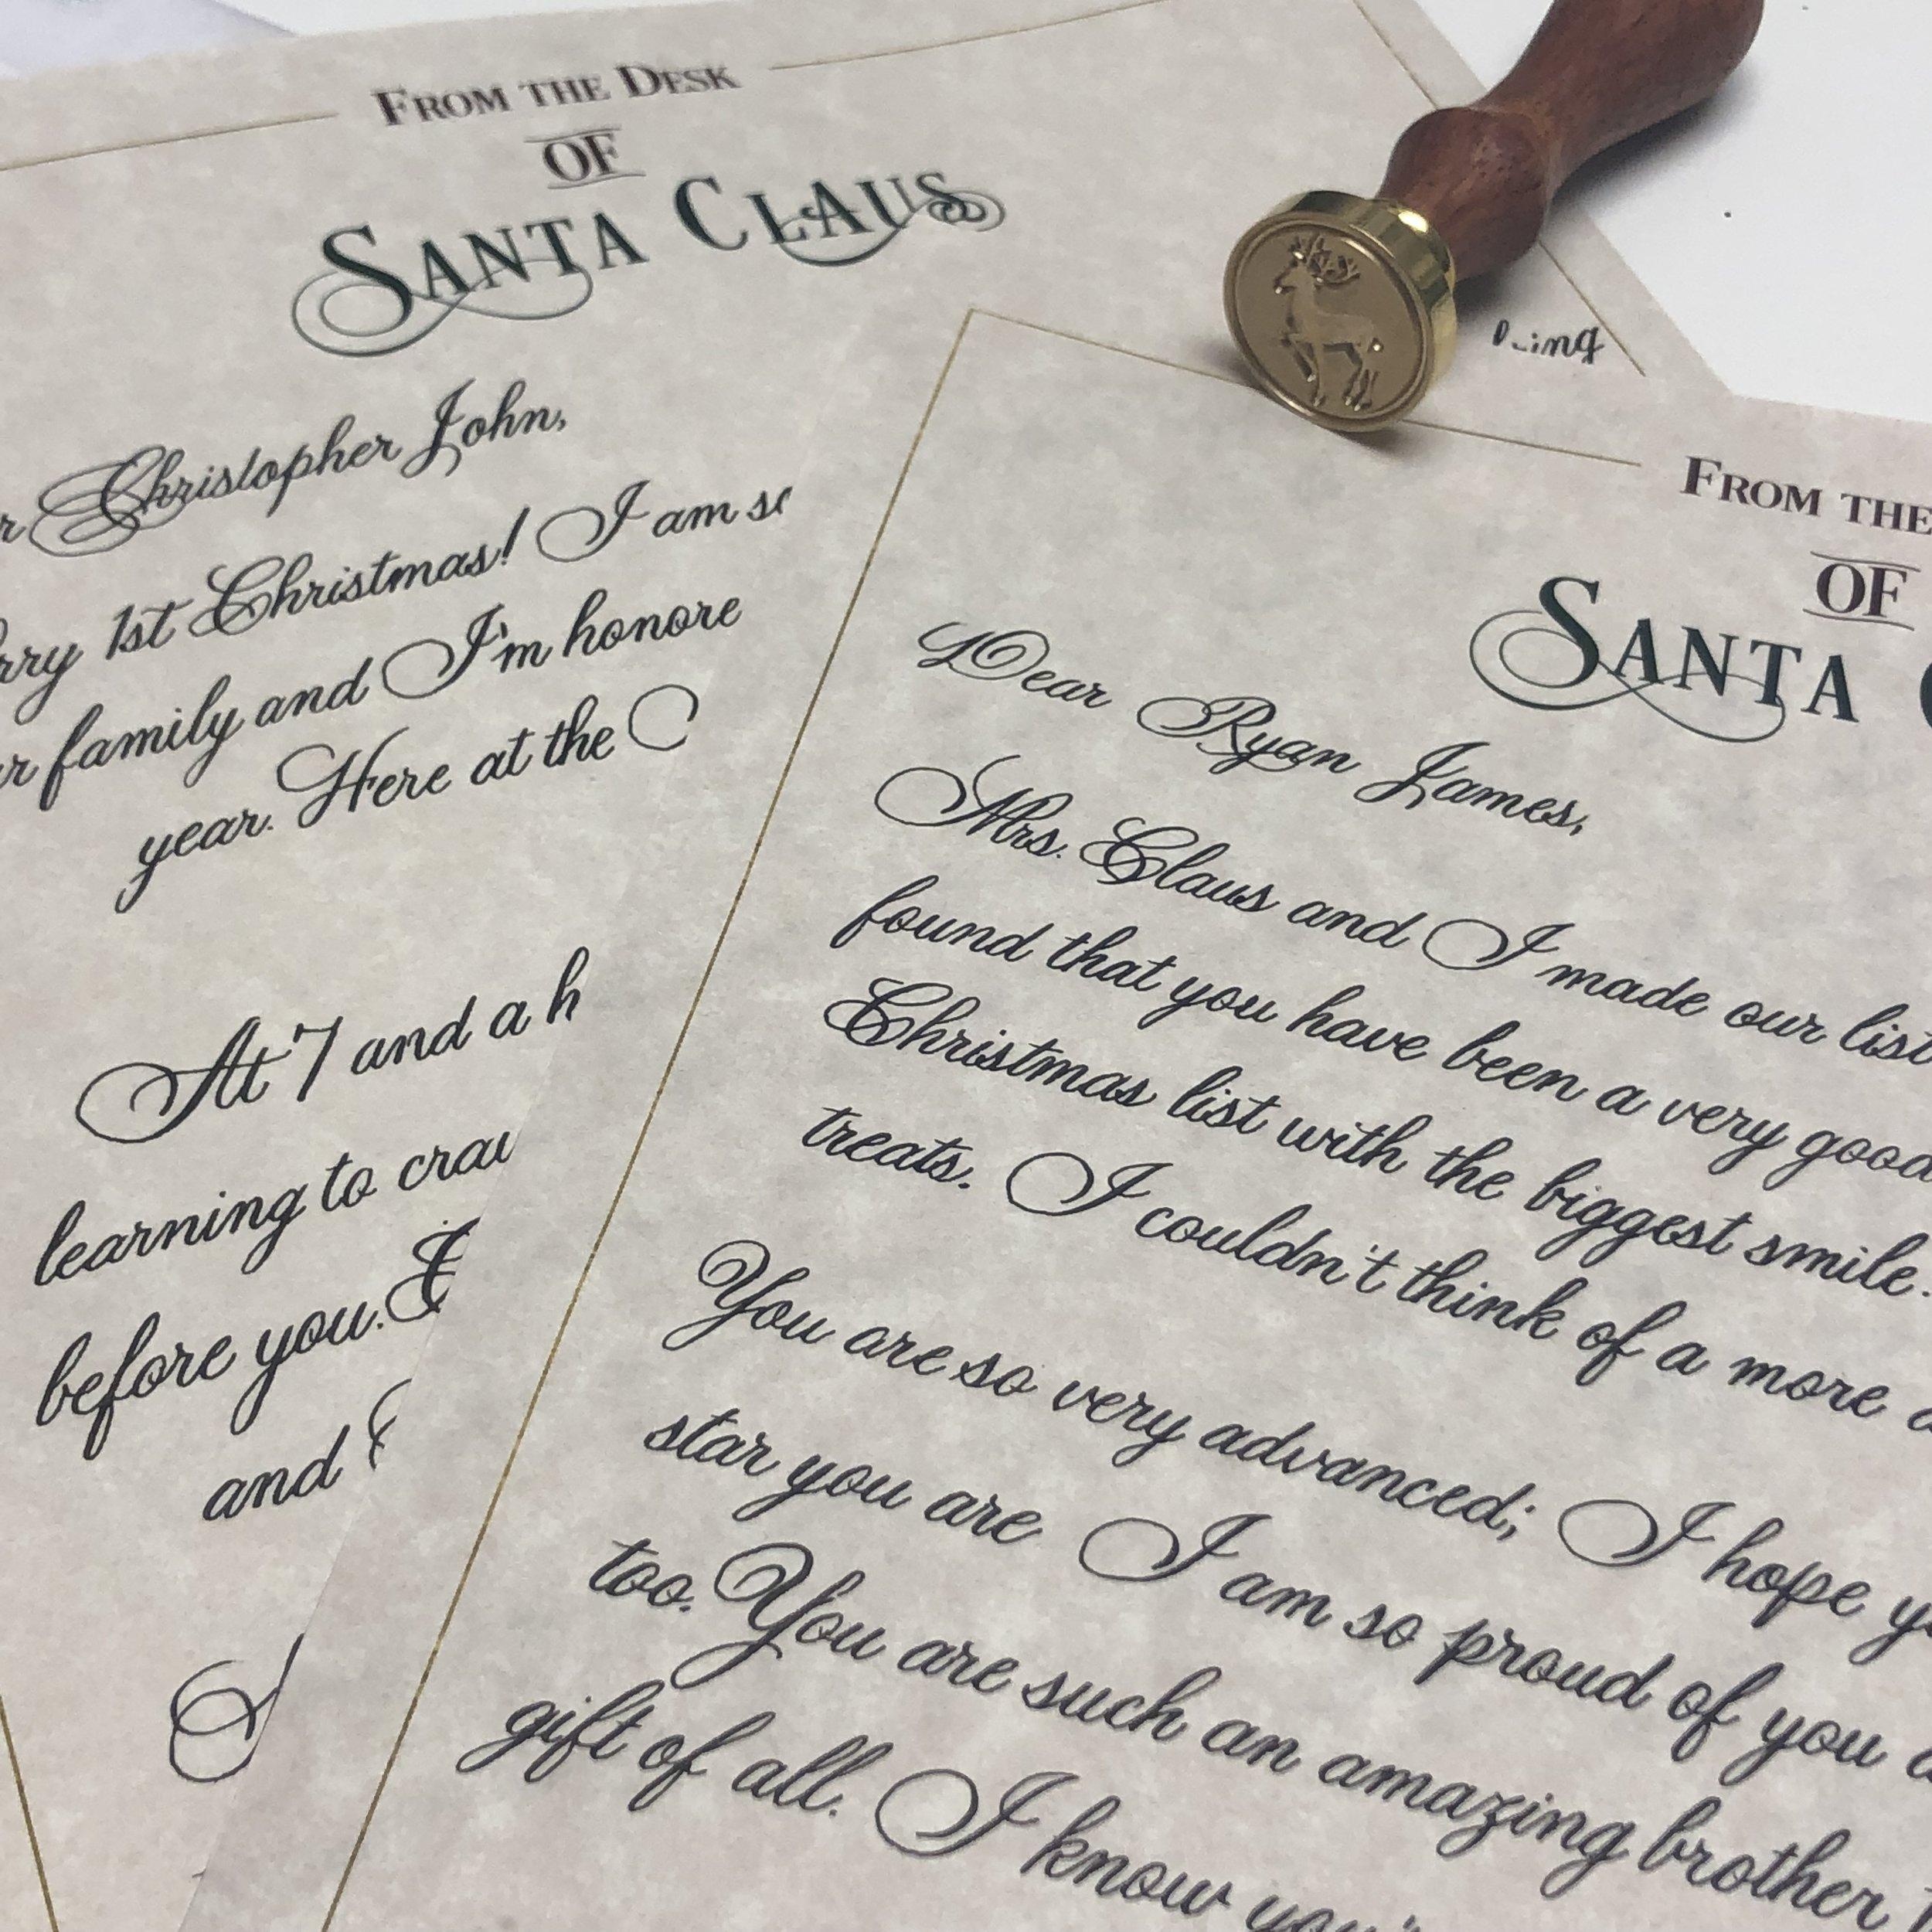 Central PA, York PA, JesSmith Designs, custom, wedding, invitations, bridal, Harrisburg, hanover, calligraphy, baltimore, wedding invitations, lancaster, gettysburg, 12-18 07.22.41.jpg